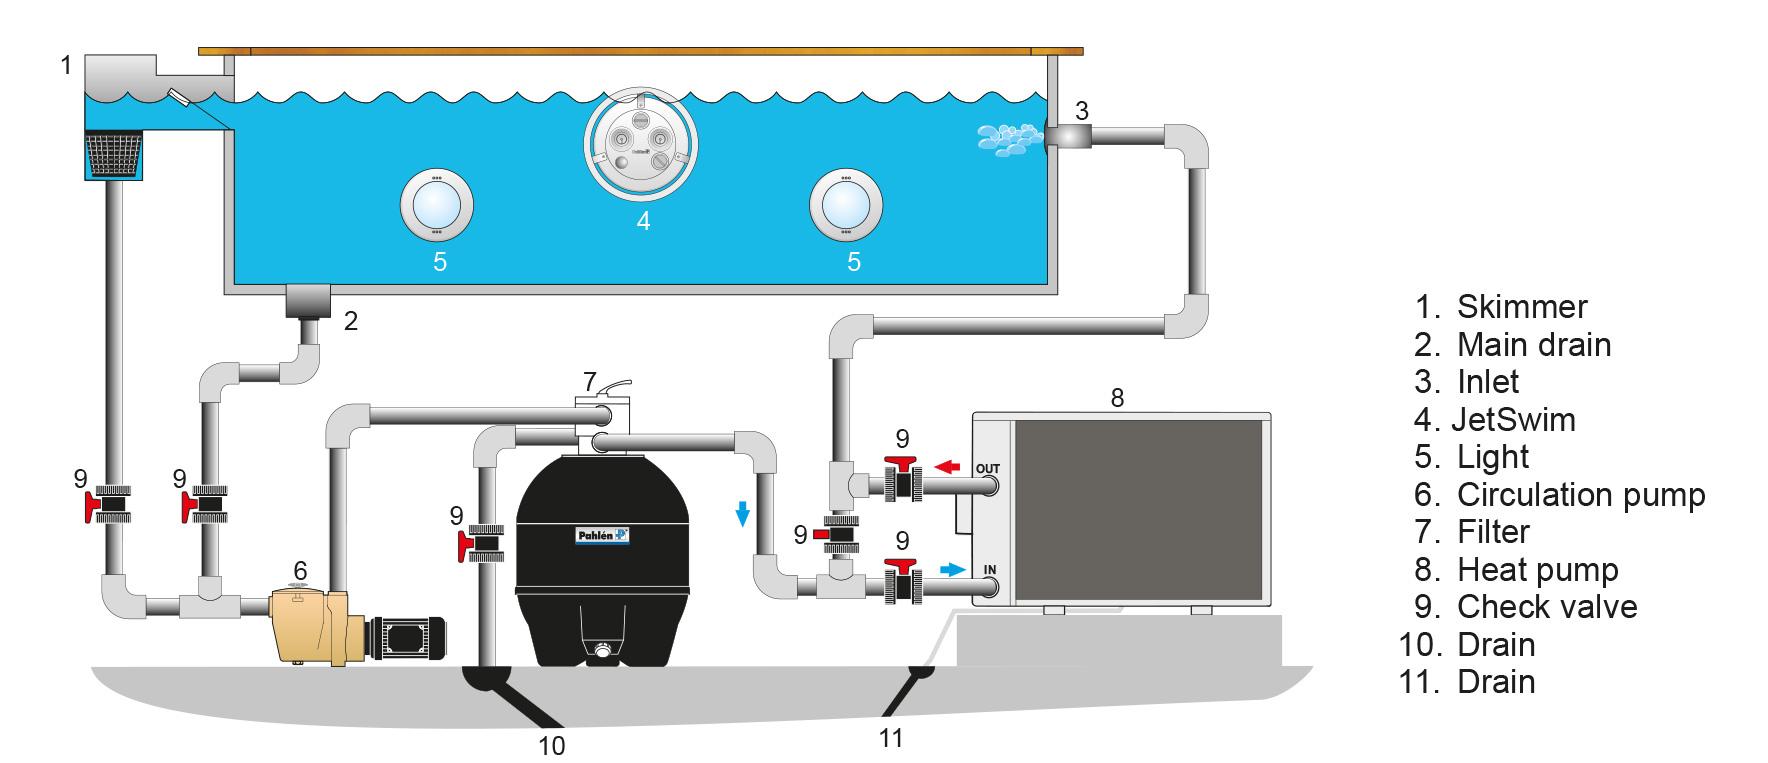 Swimming Pool Schematic Heat Exchanger, Electric Heater